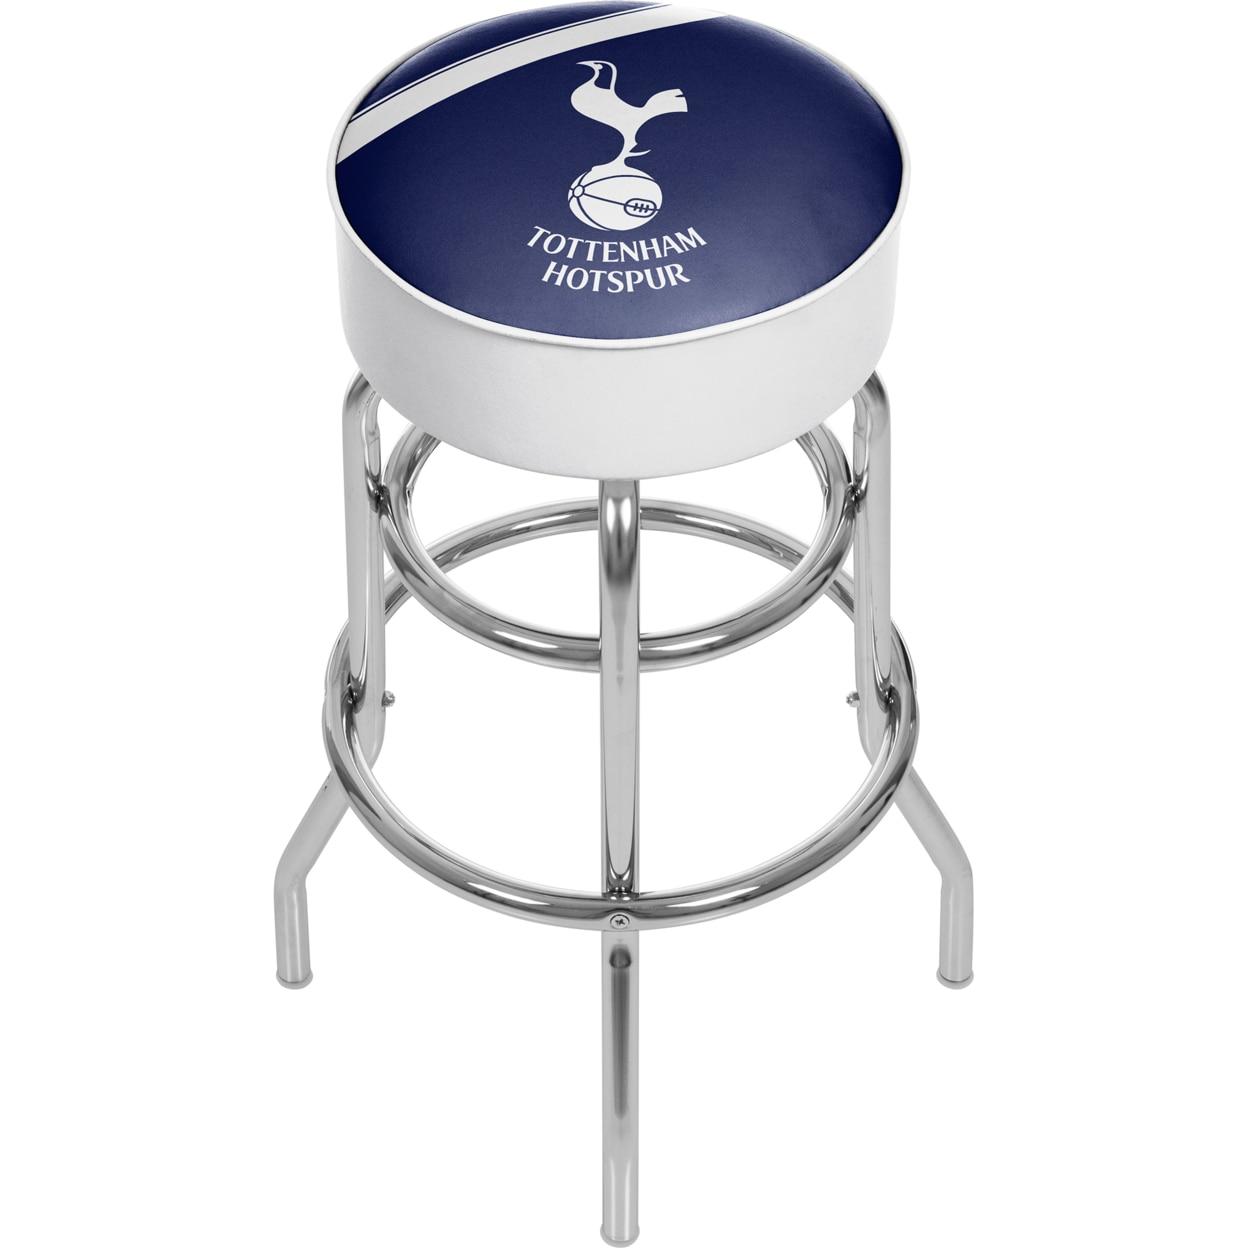 English Premier League Padded Swivel Bar Stool 30 Inches High - Tottenham Hotspurs premier league liverpool football club chrome 42 inch pub table